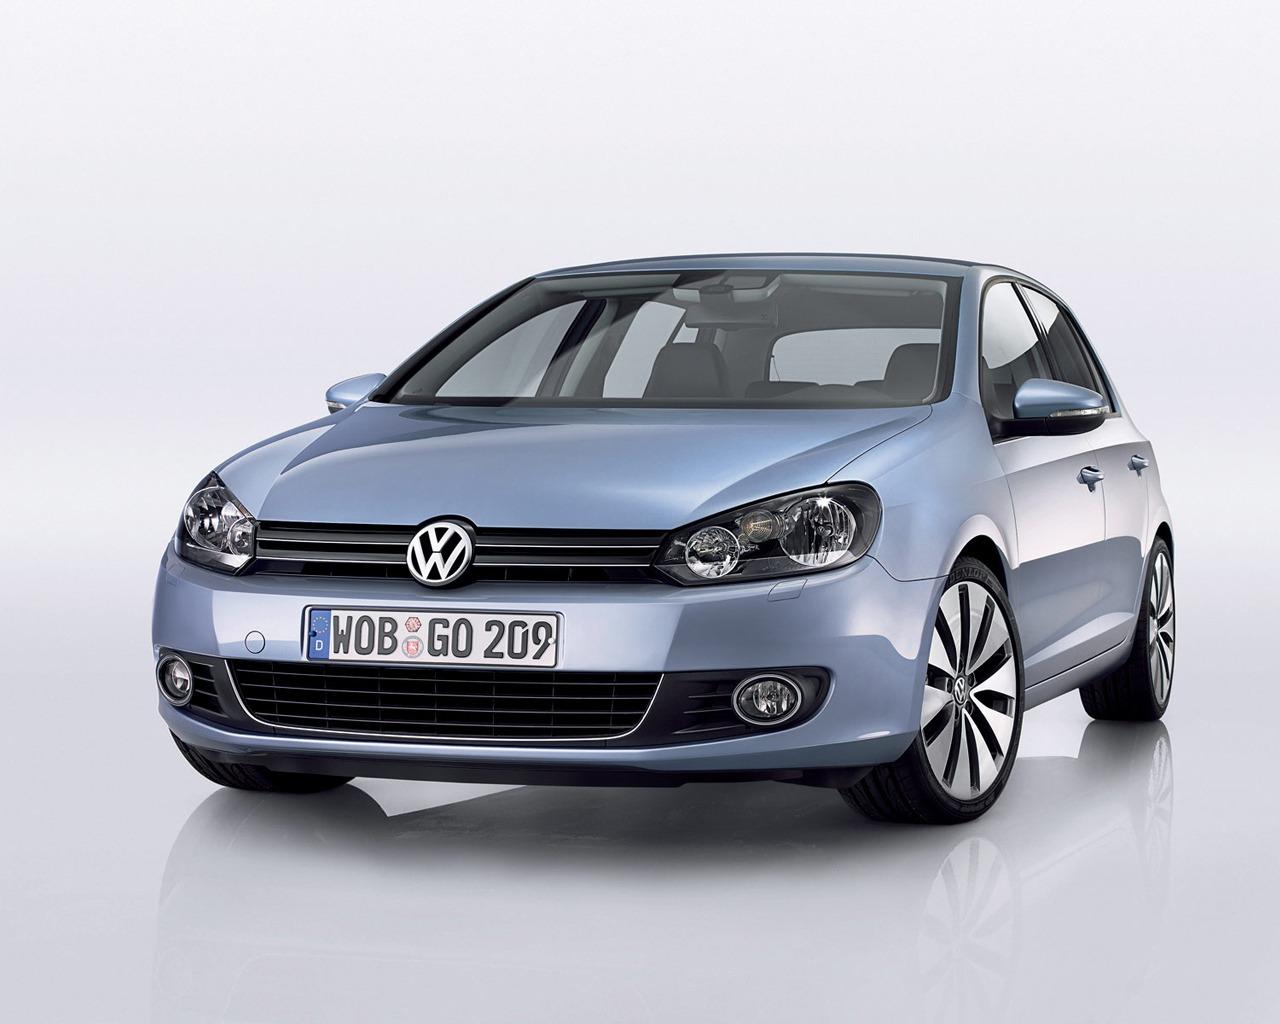 VW Golf VI Wallpaper Volkswagen Cars Wallpapers